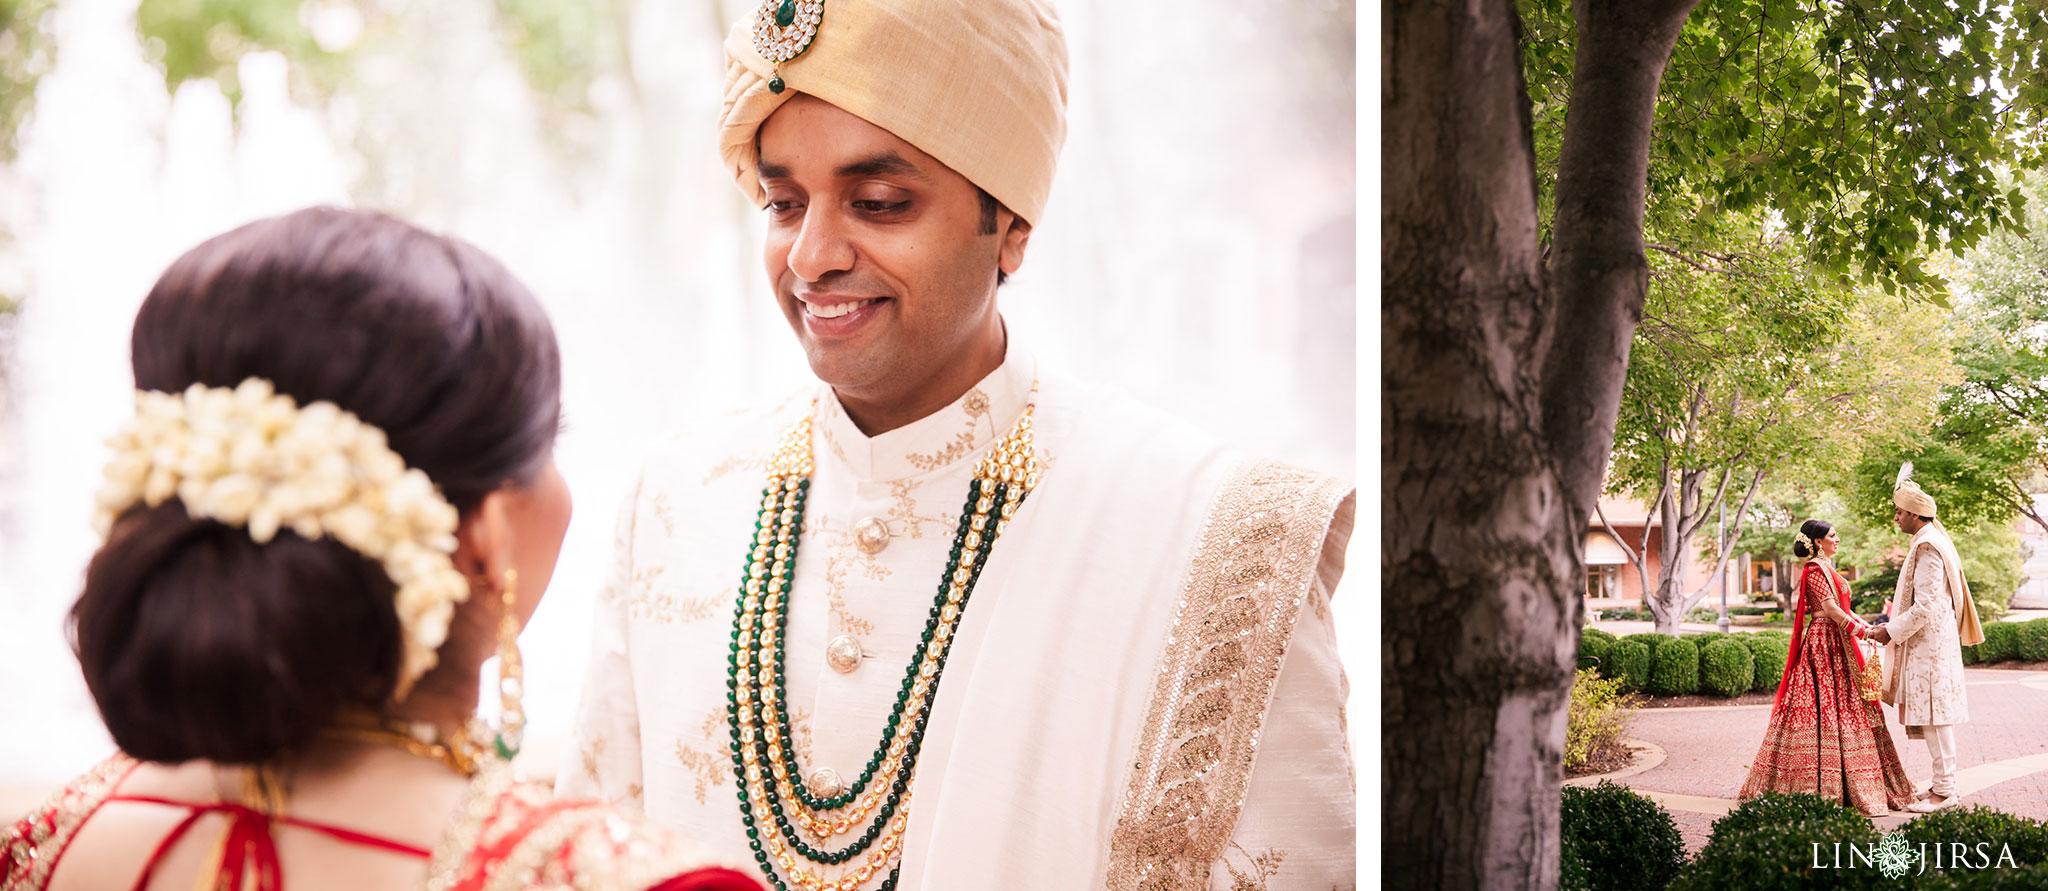 22 Ritz Carlton St Louis Missouri Indian Wedding Photography